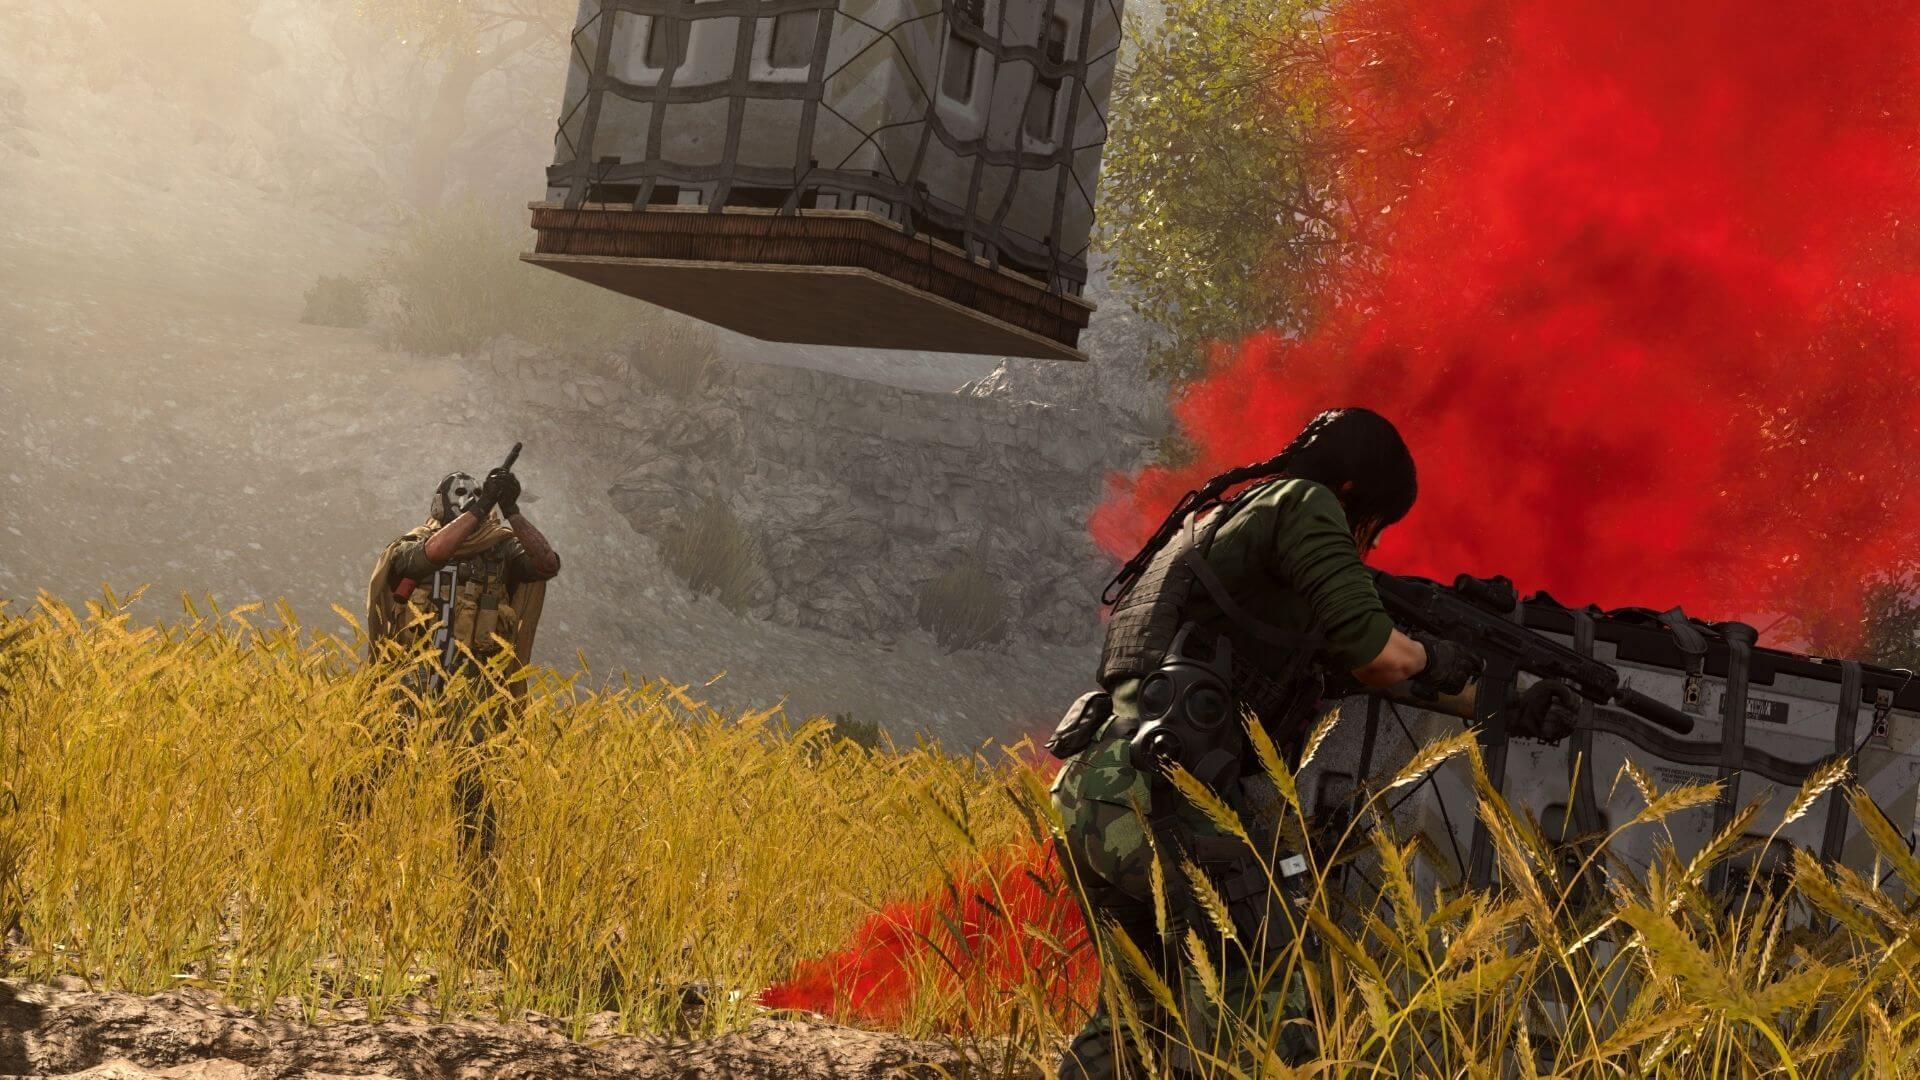 Bizarre-Warzone-loadout-glitch-gives-players-10-weapons-LOADOUT